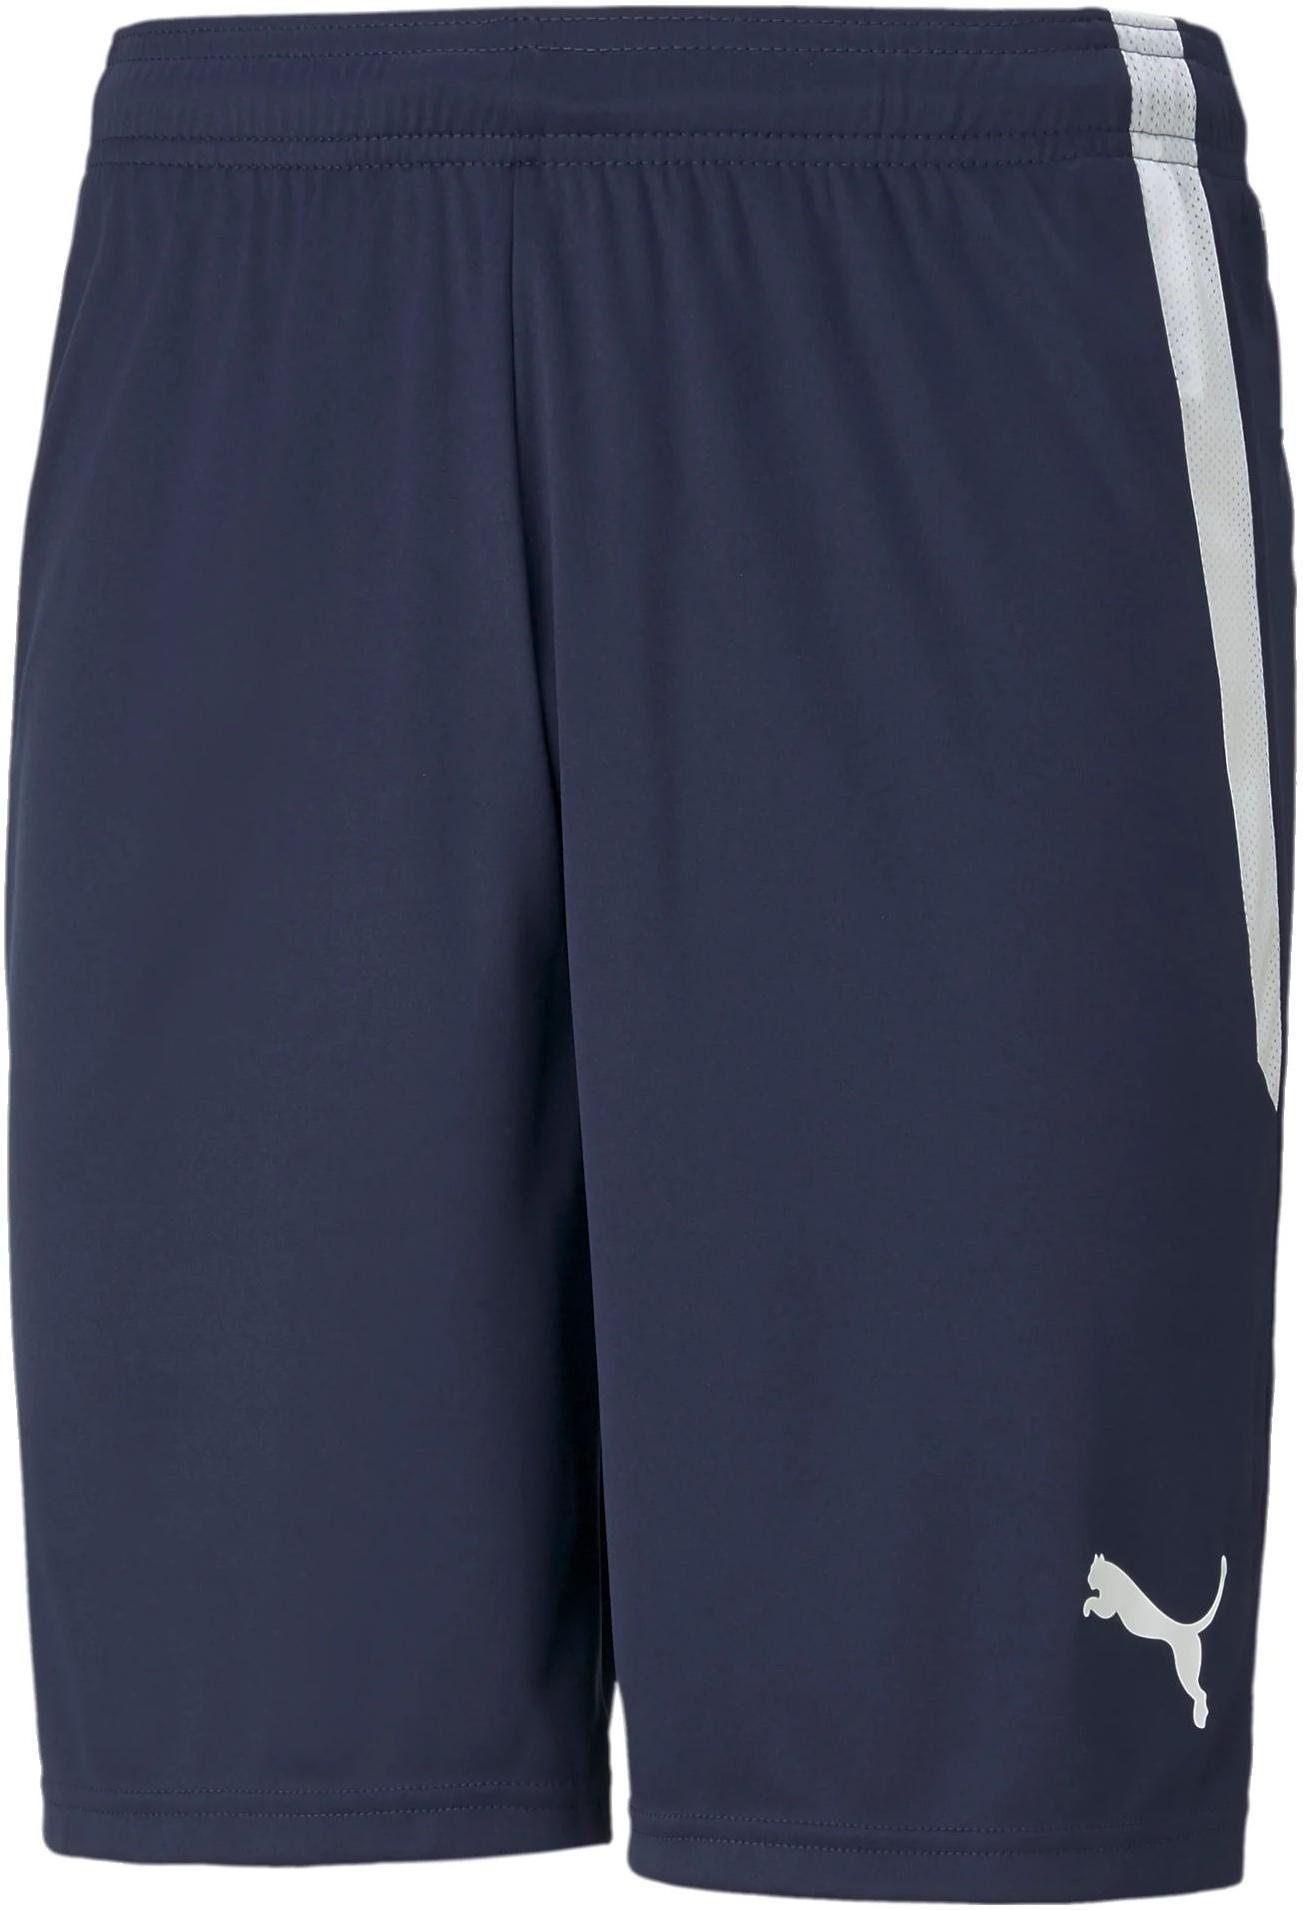 Šortky Puma teamLIGA Shorts